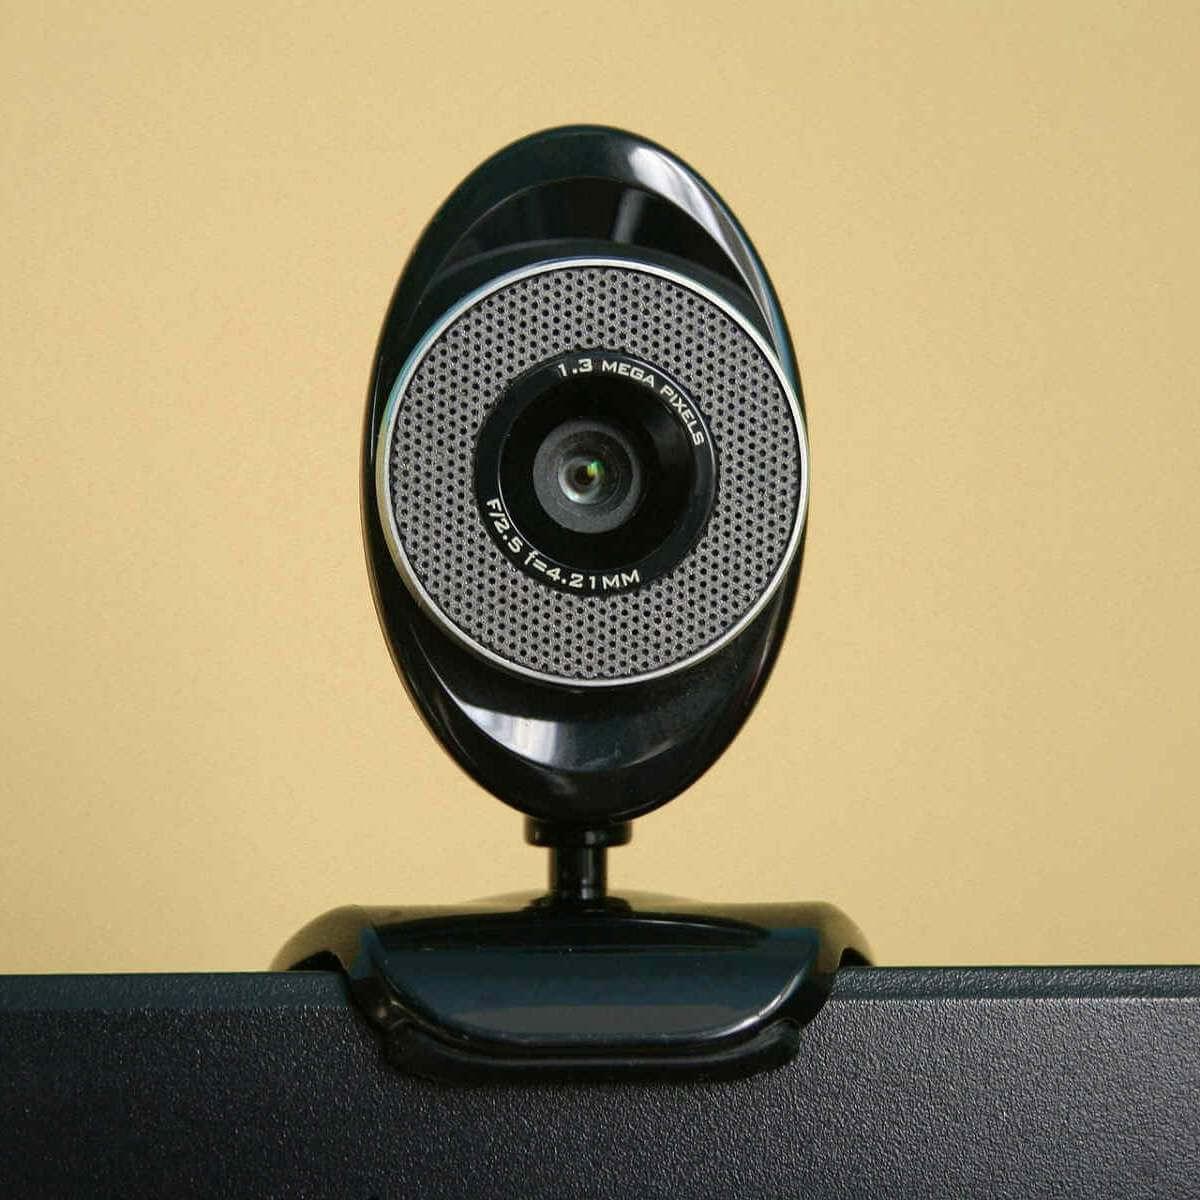 lỗi webcam 0xa00f4243